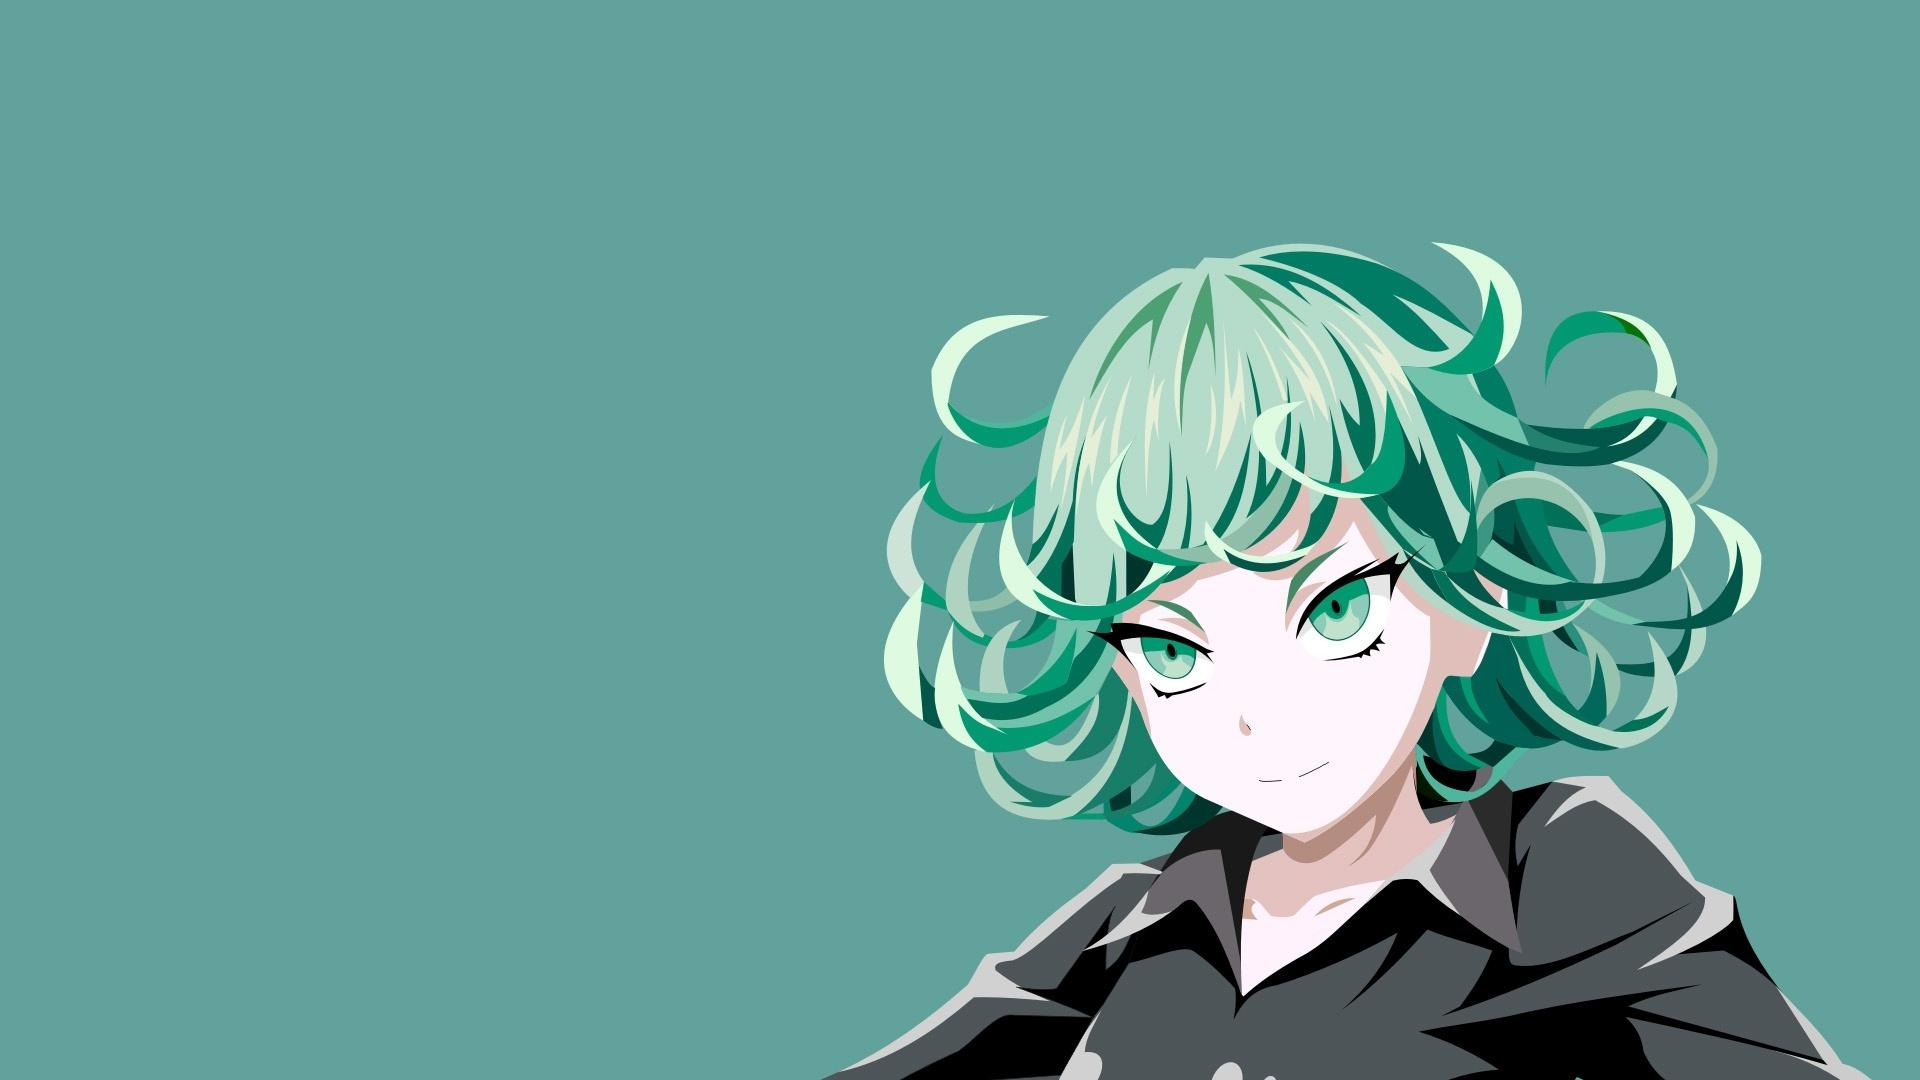 Anime Girl Smile free background